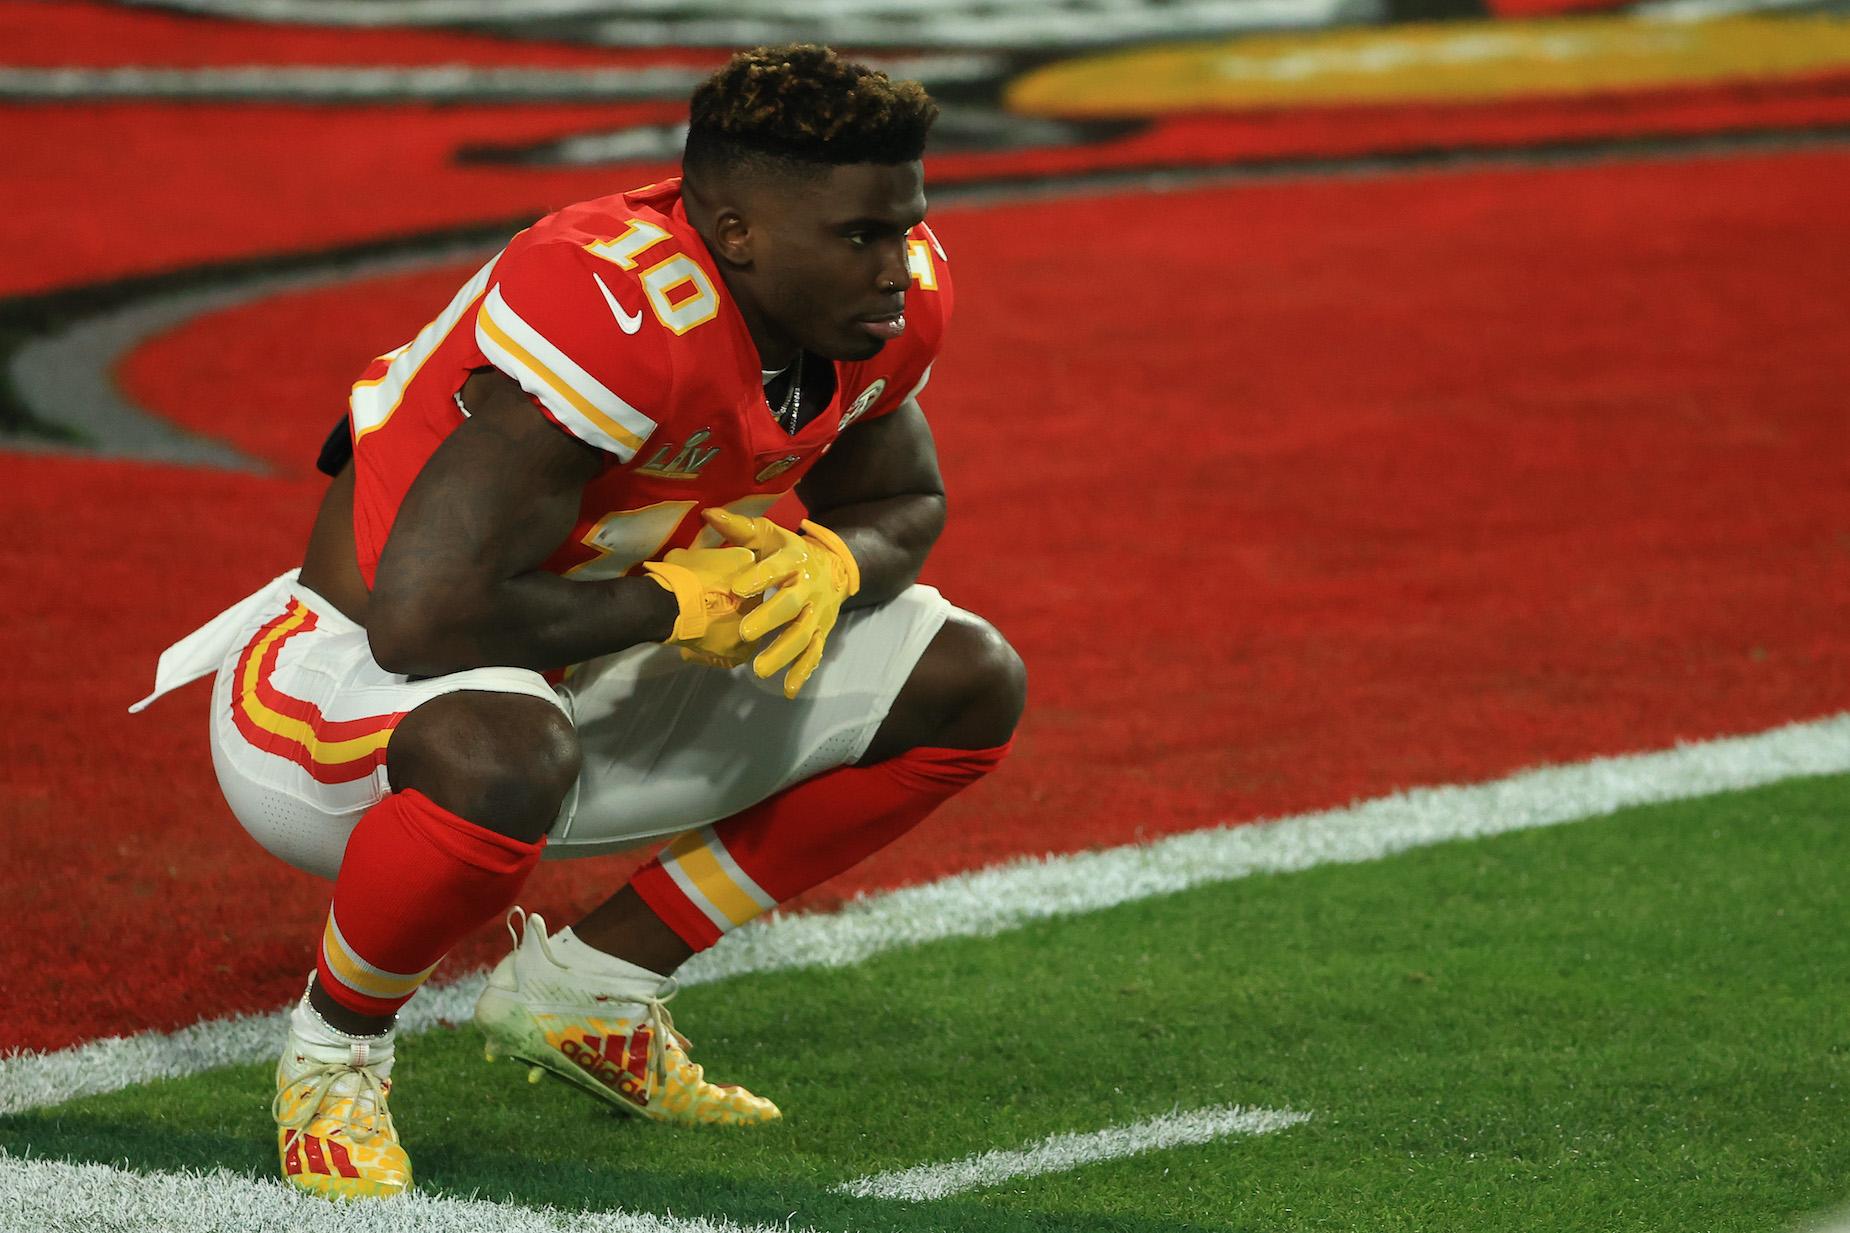 Kansas City Chiefs wide receiver Tyreek Hill ahead of Super Bowl 55